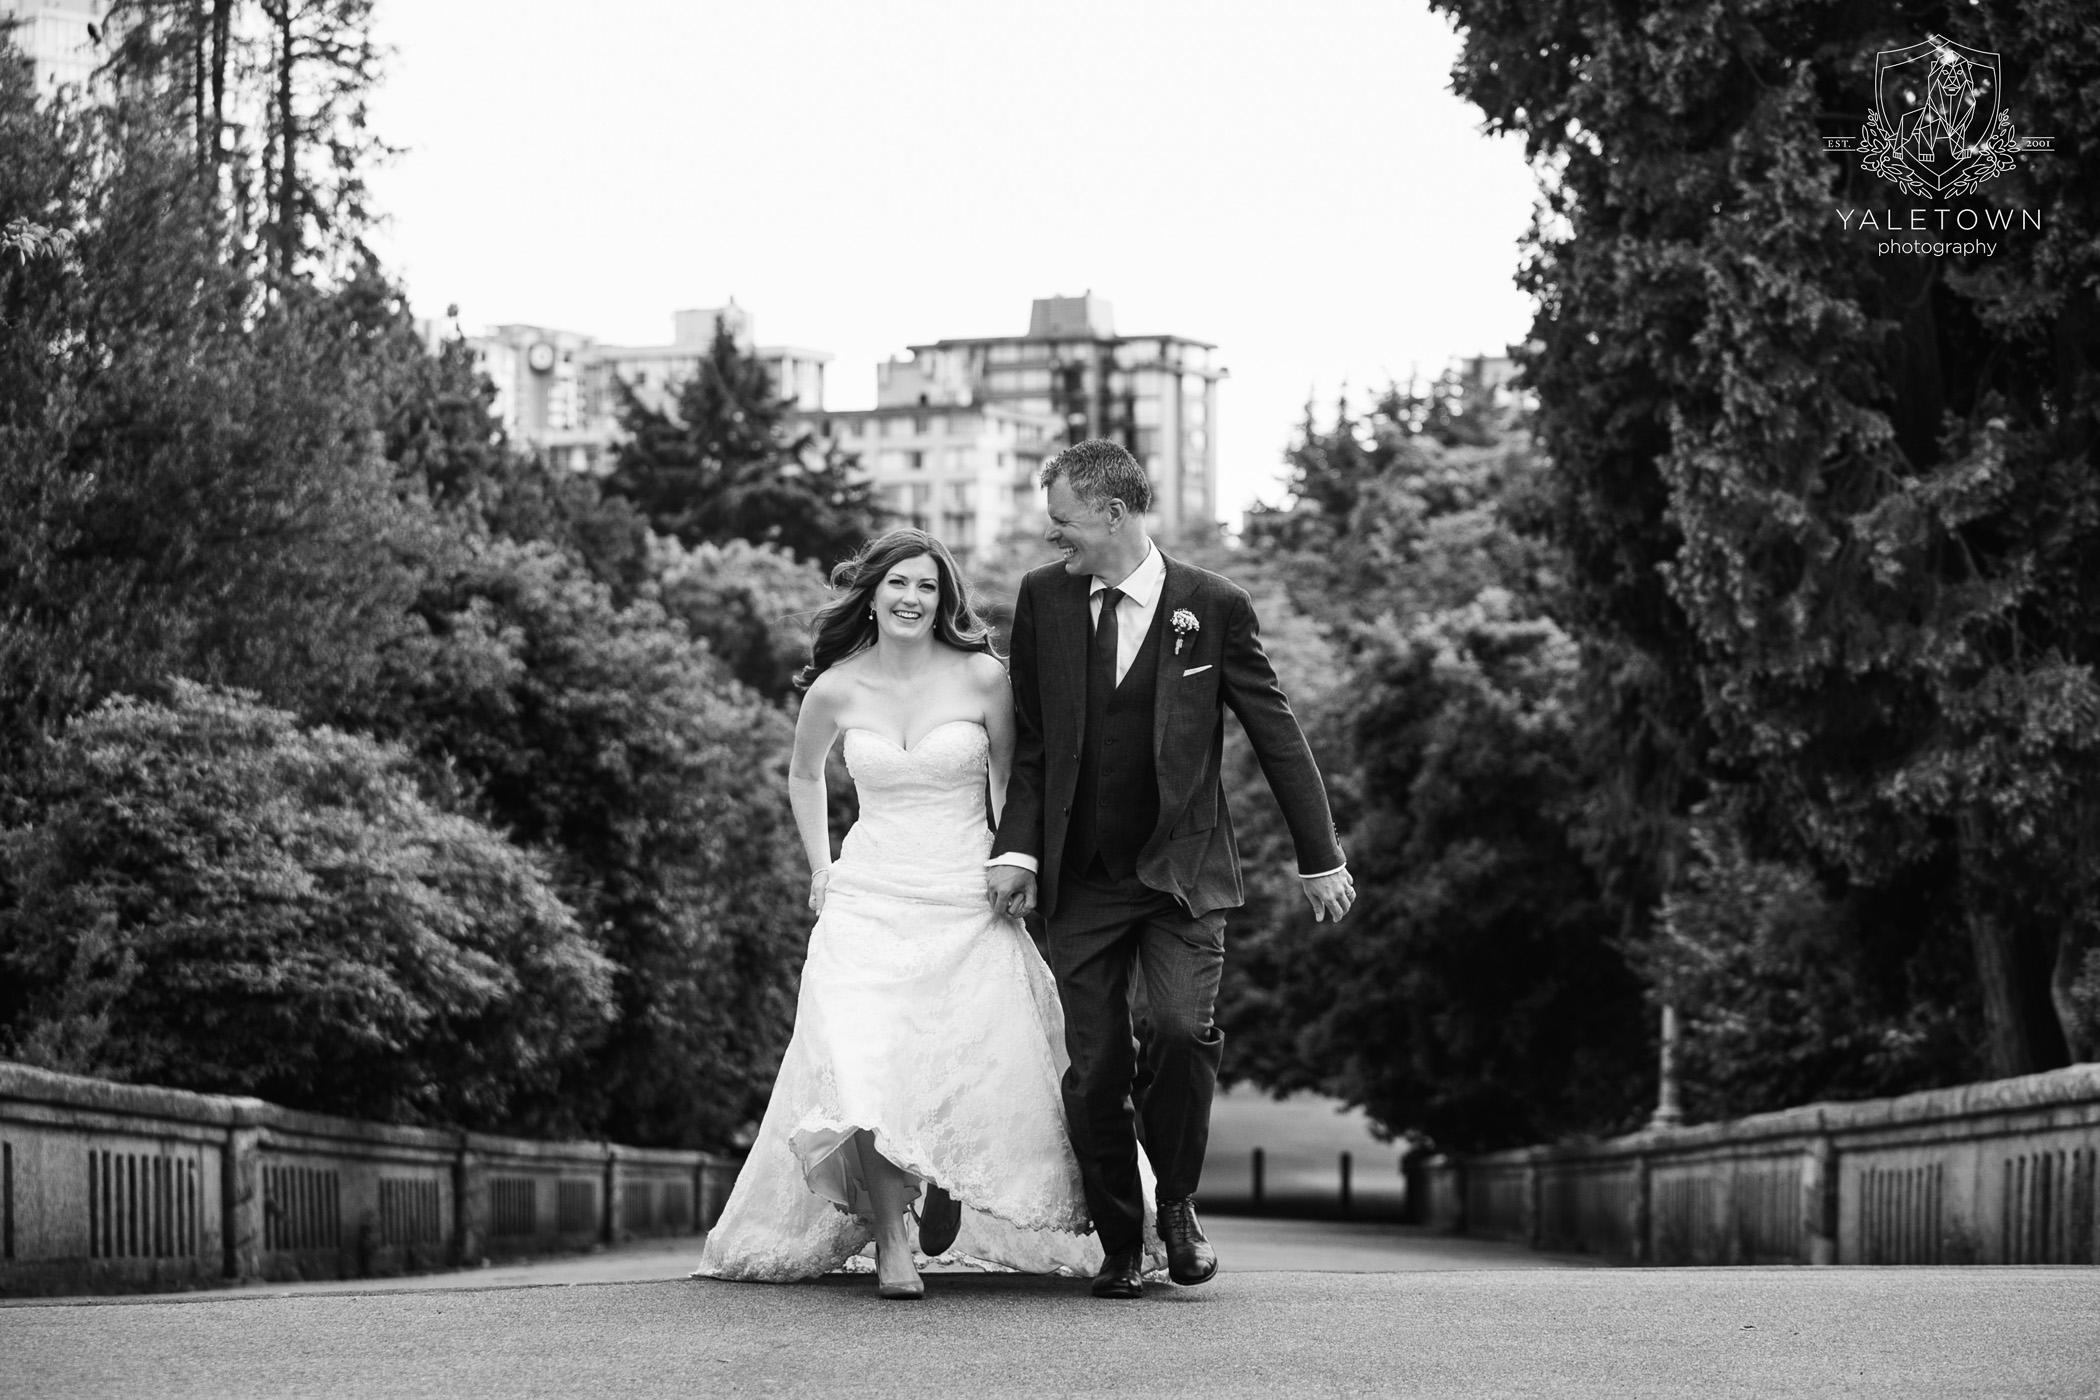 vancouver-rowing-club-stanley-park-wedding-yaletown-photography-vancouver-wedding-photographer-photo